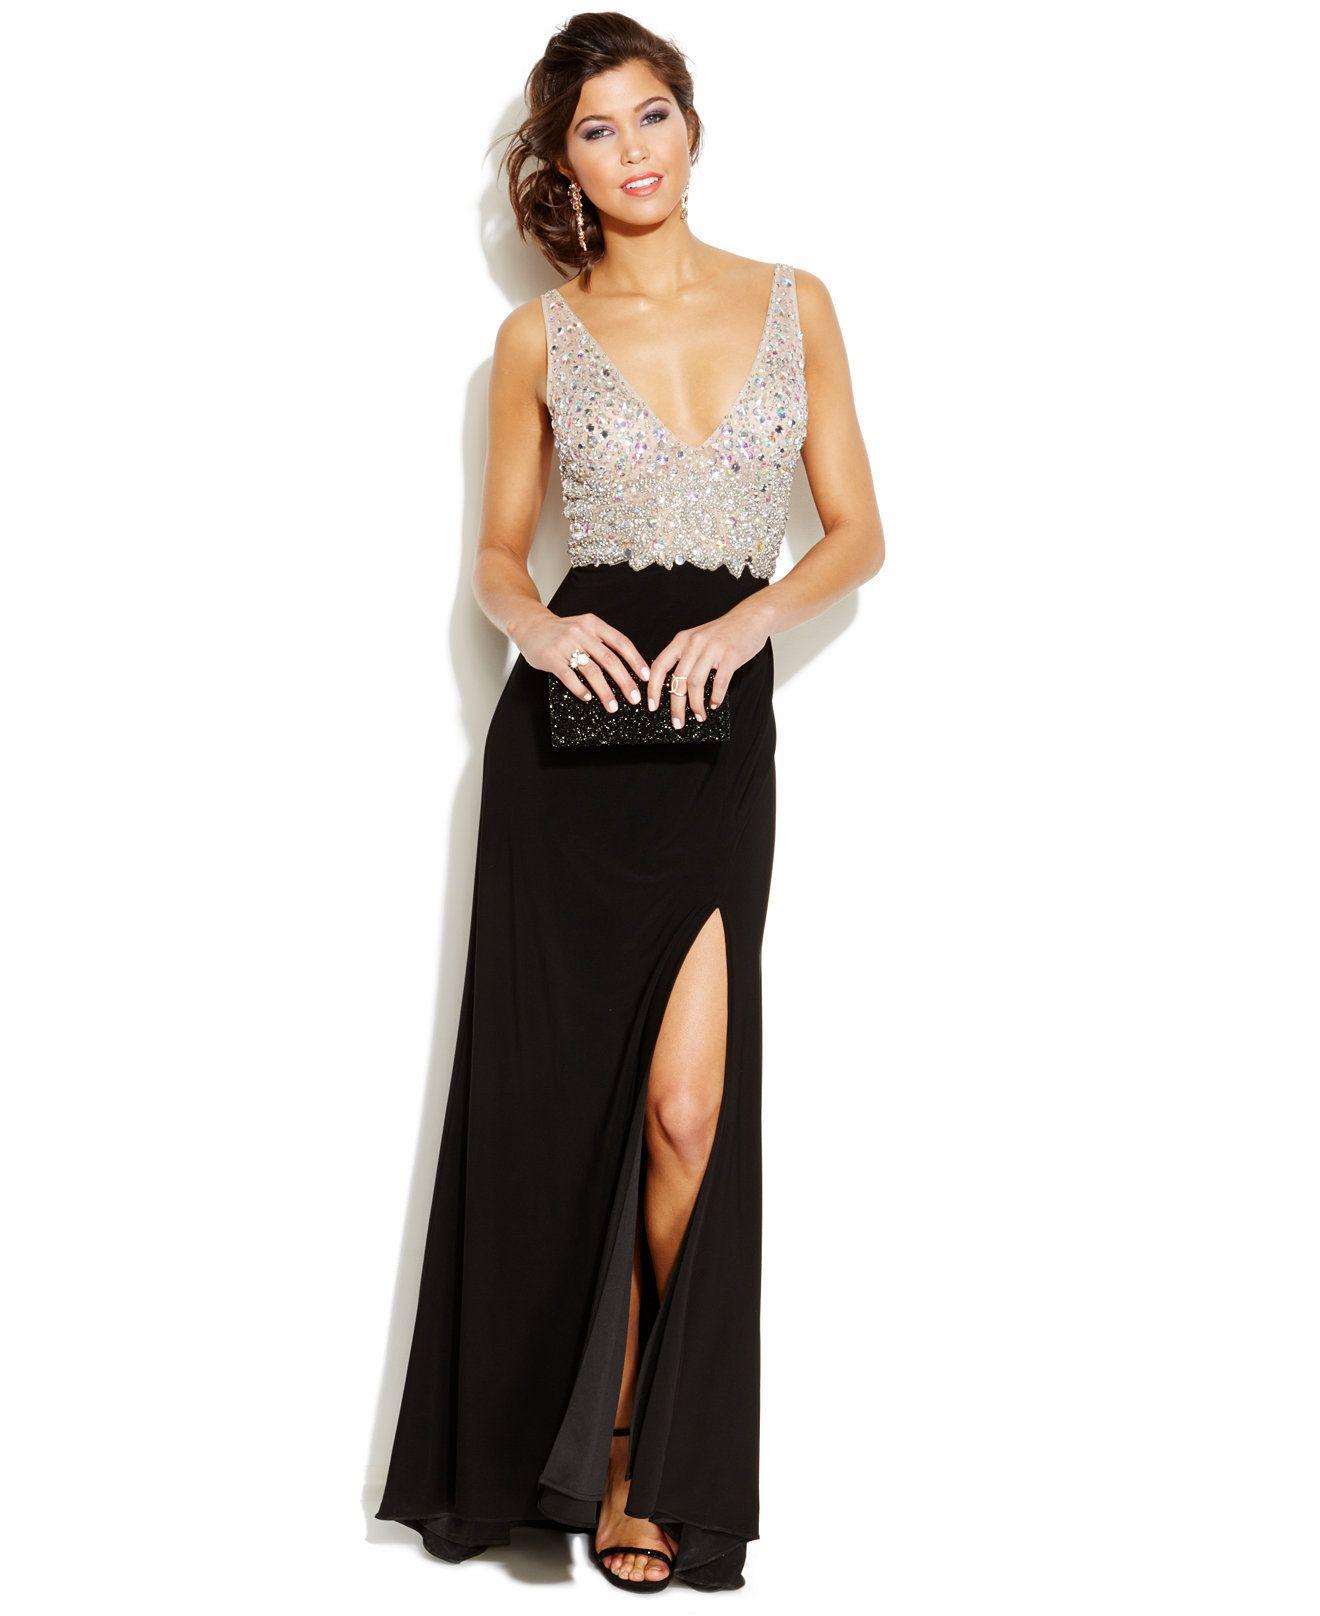 802d27ef1 Blondie Nites Juniors' Embellished Plunging-Neckline Gown - Juniors Dresses  - Macy's